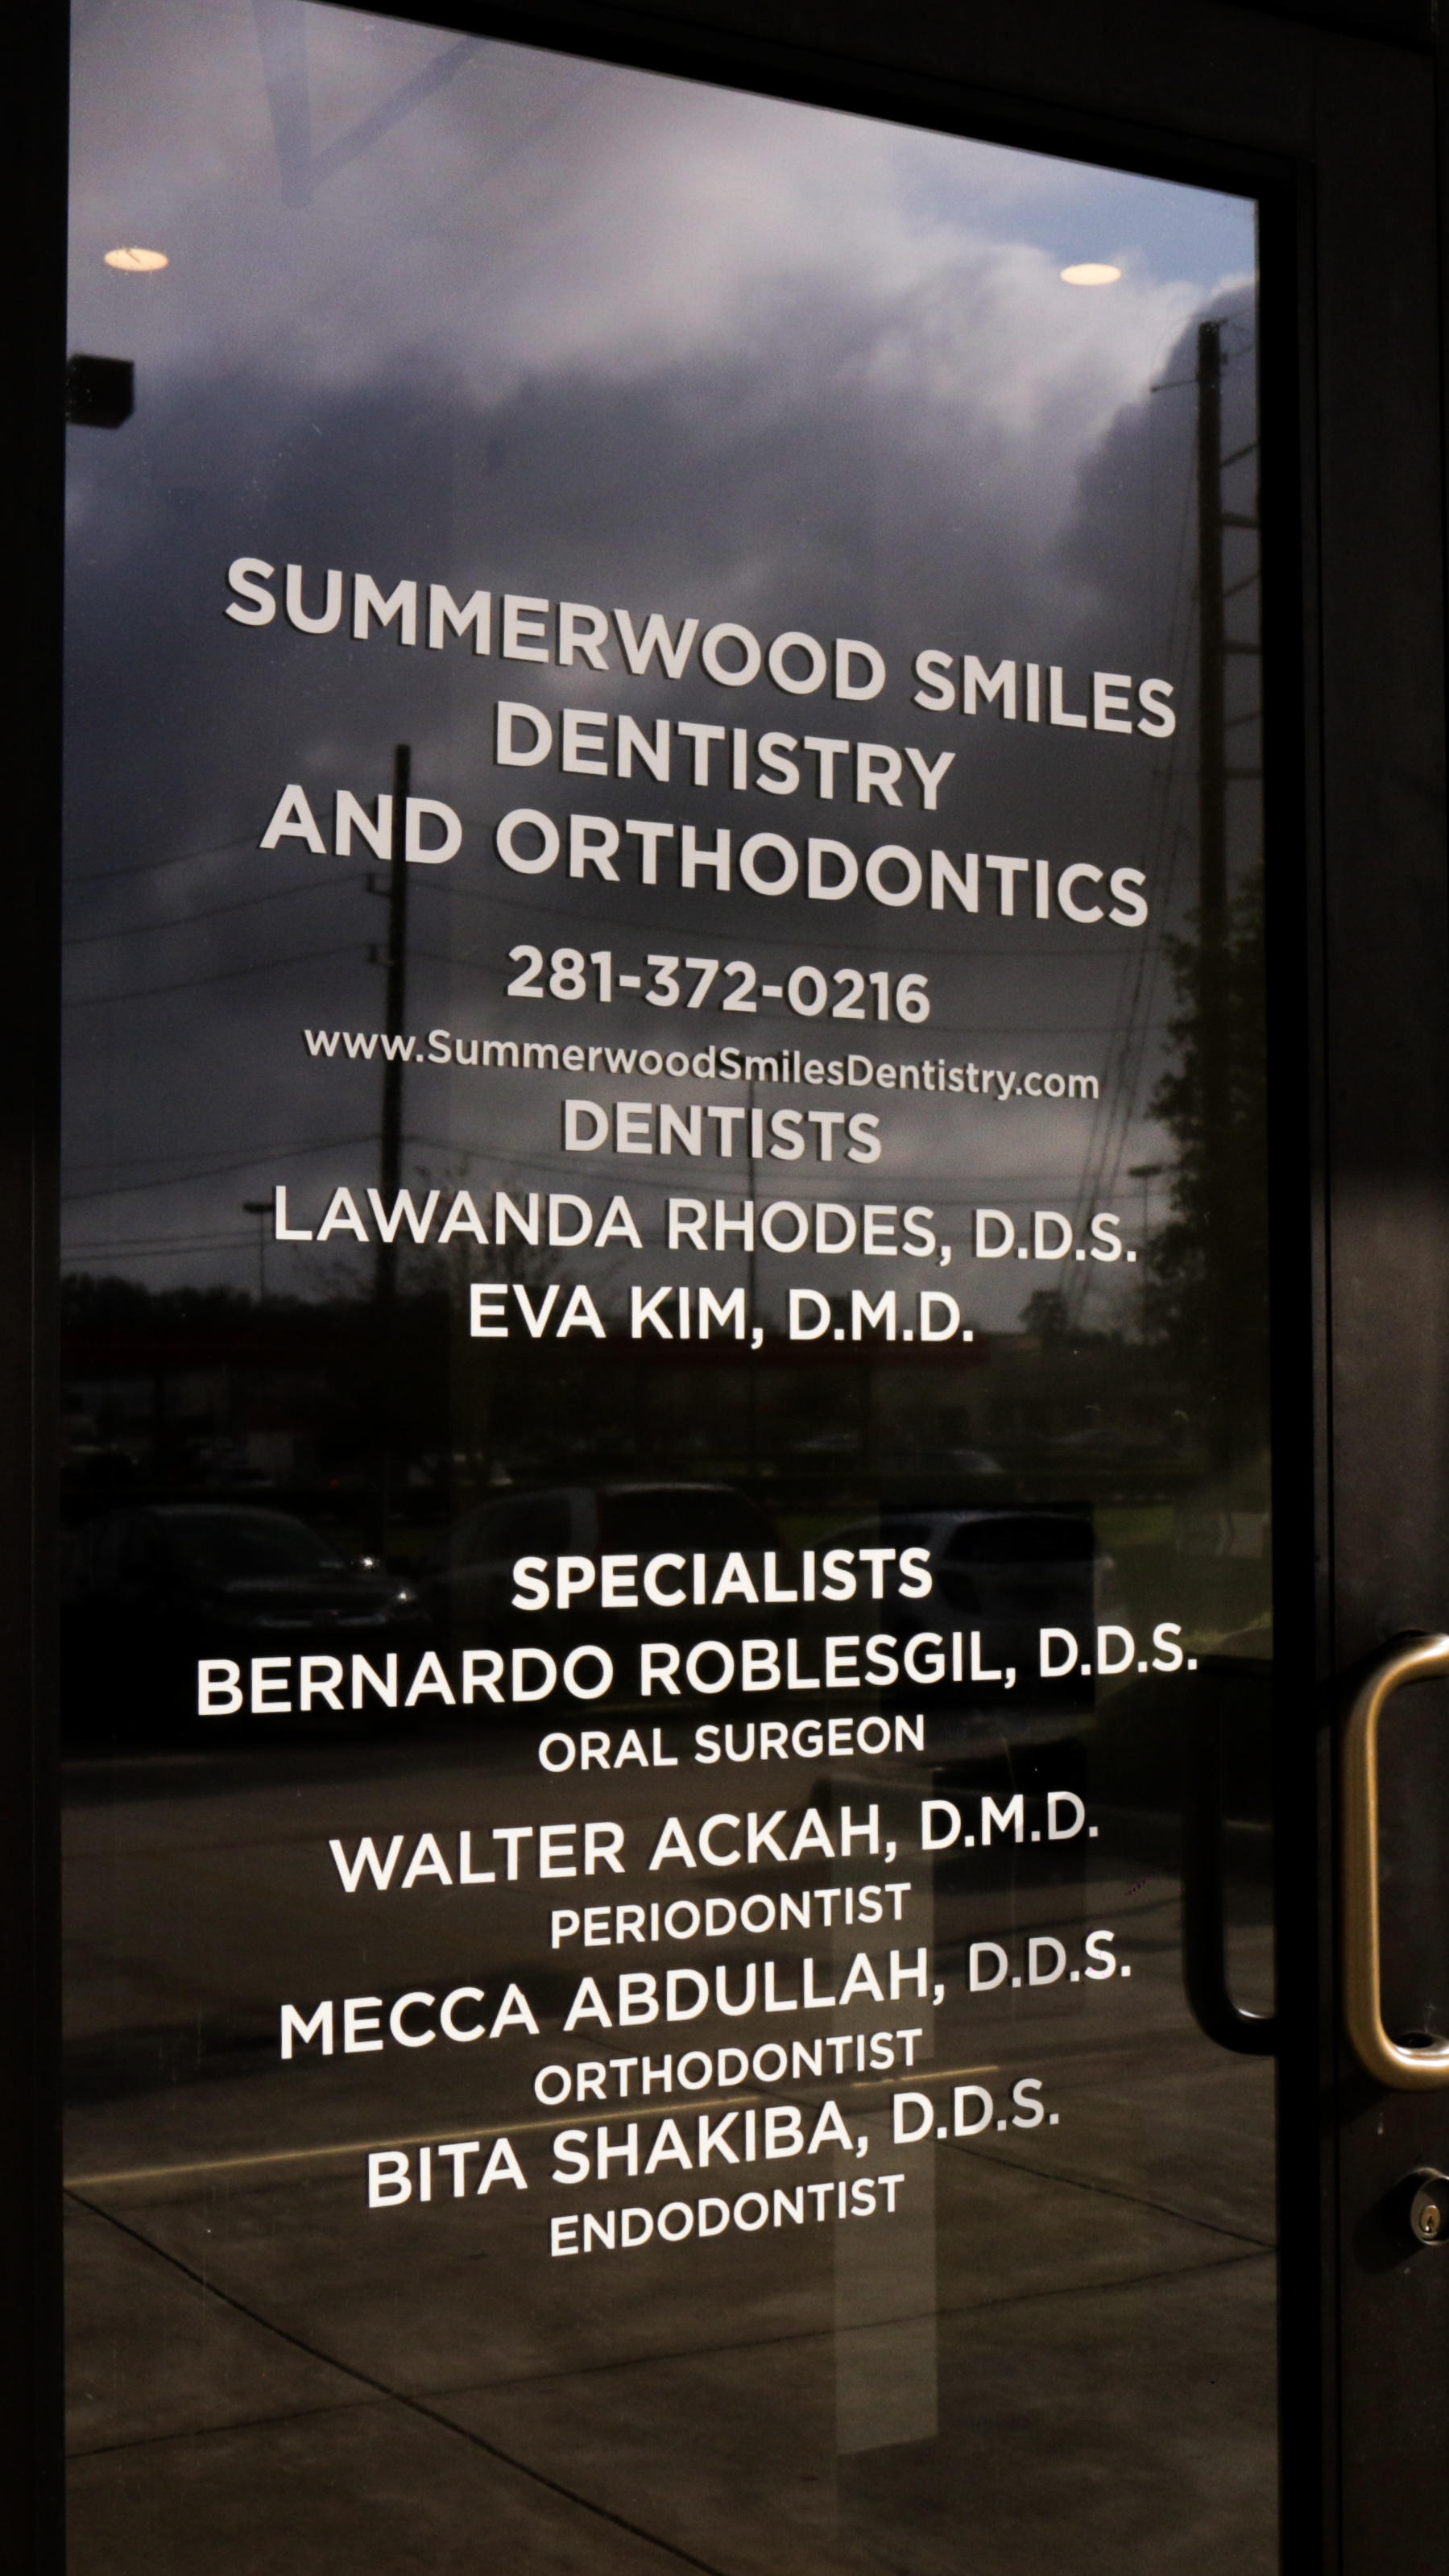 Summerwood Smiles Dentistry and Orthodontics image 3